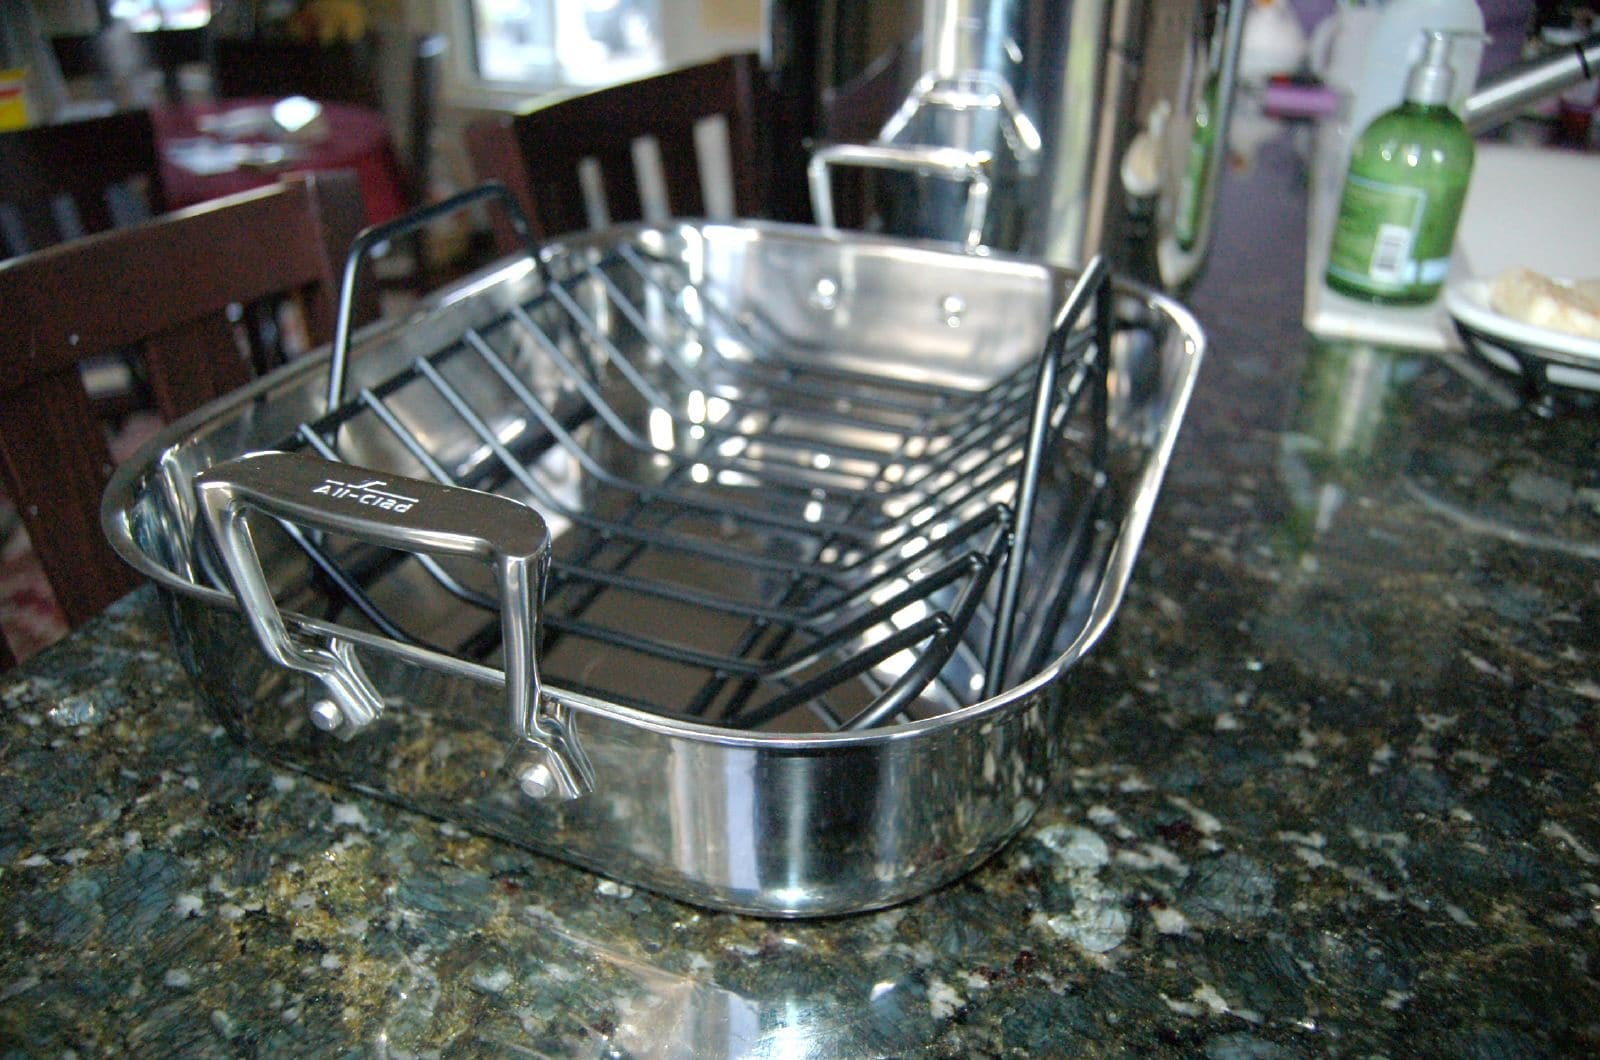 stainless steel bakeware, stainless steel bakeware set